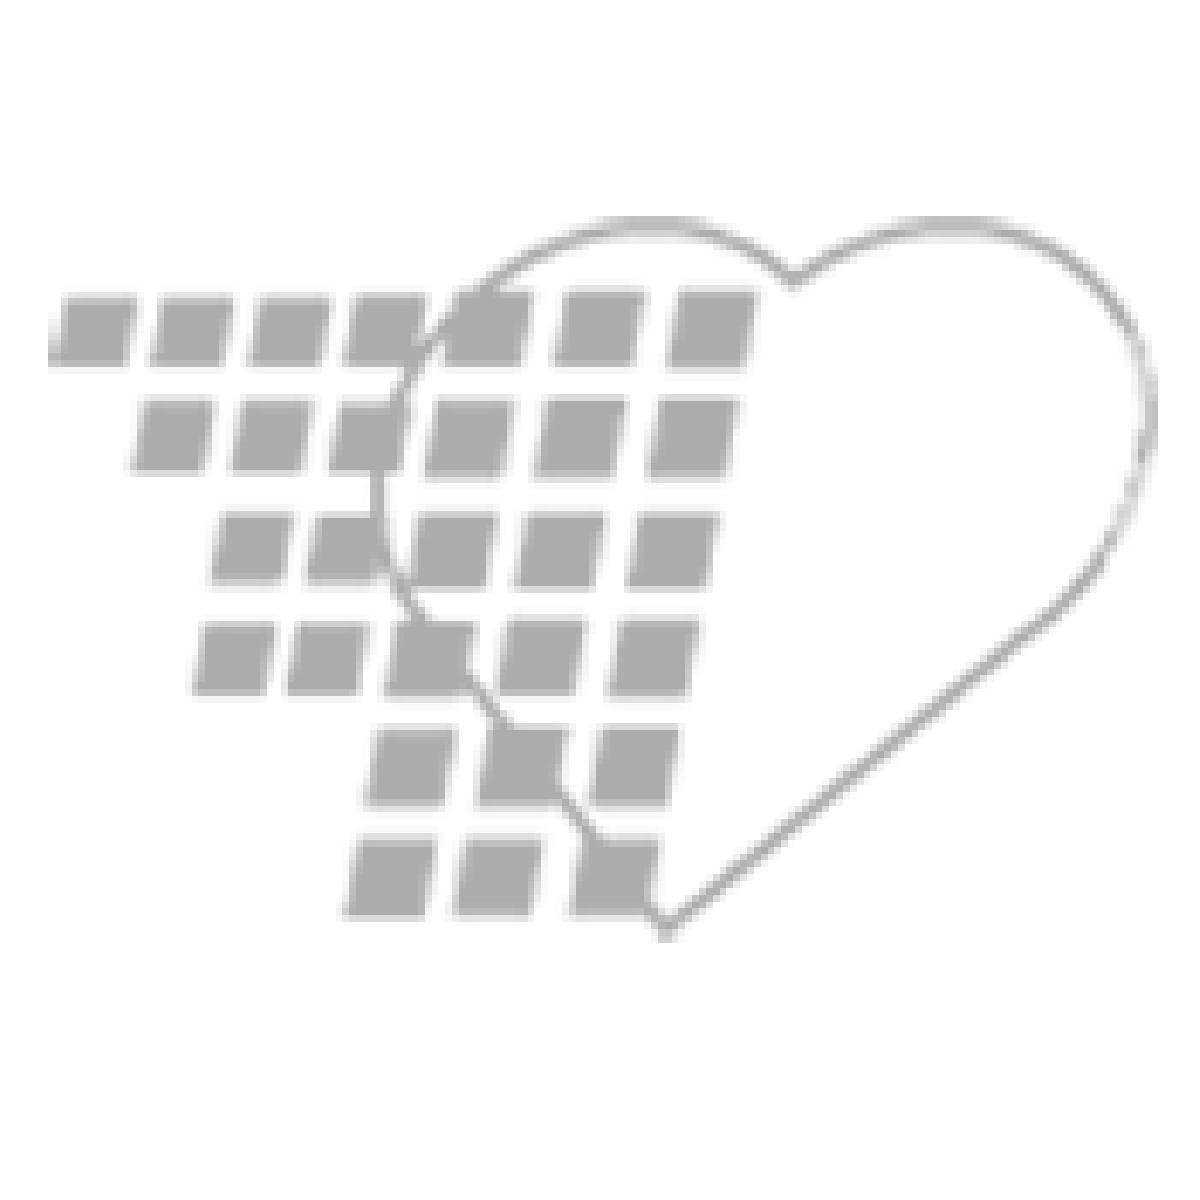 02-43-450 HeartSine Samaritan® PAD 450P